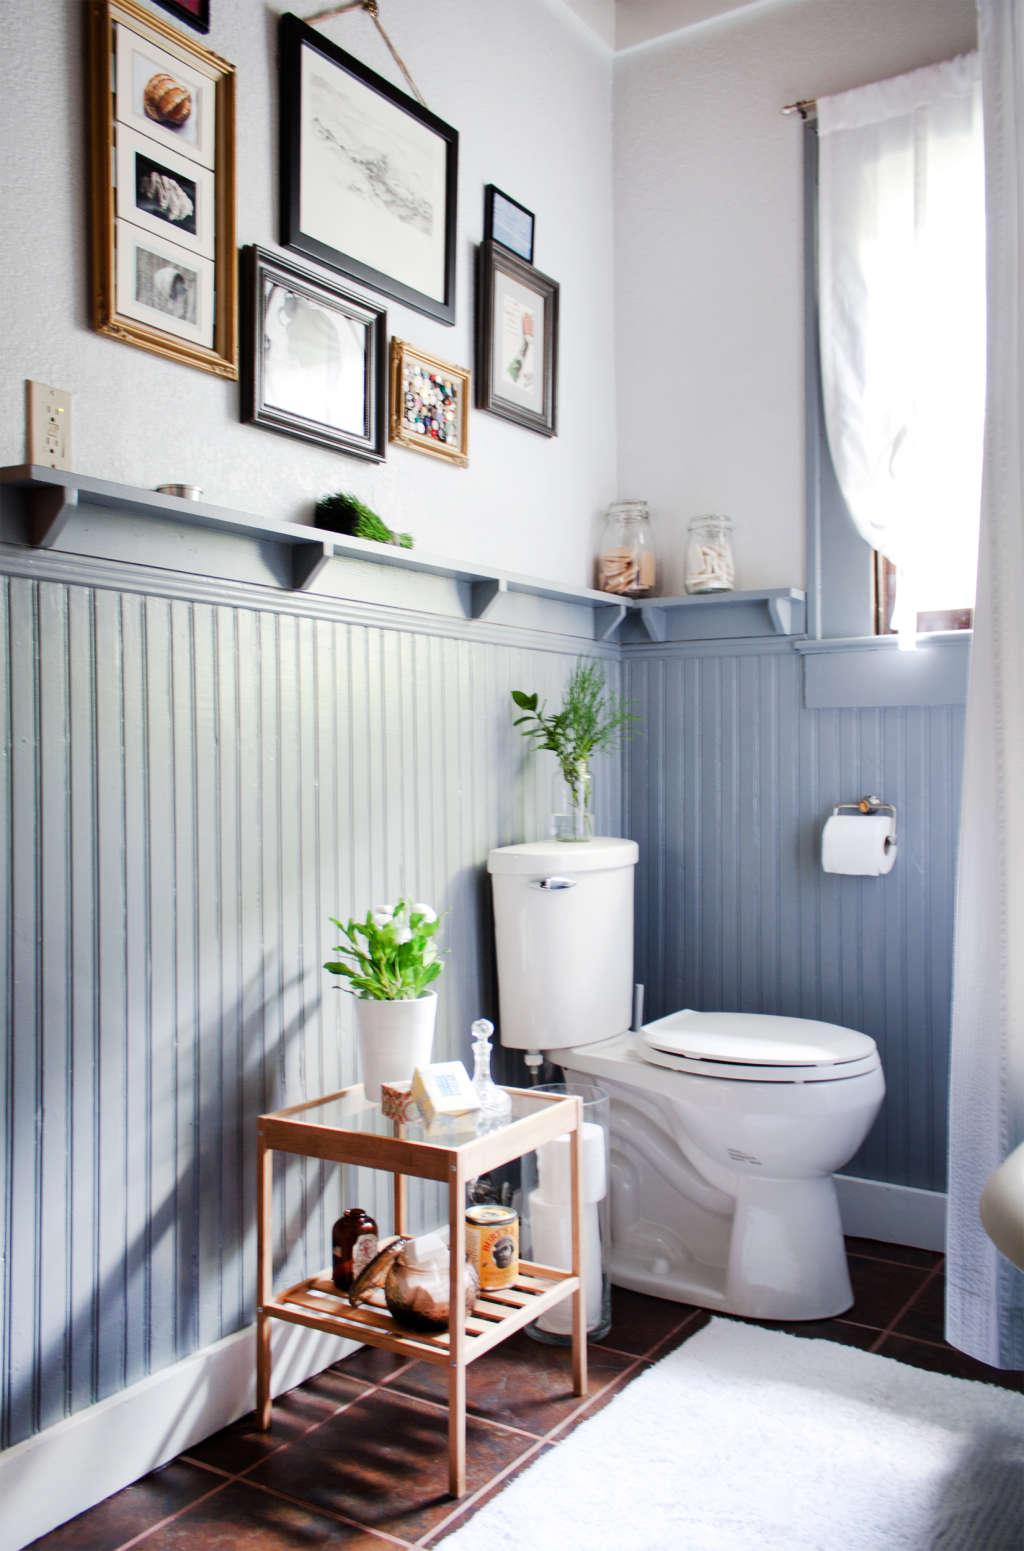 5 Simple Ways to Make Your Bathroom Feel Like New